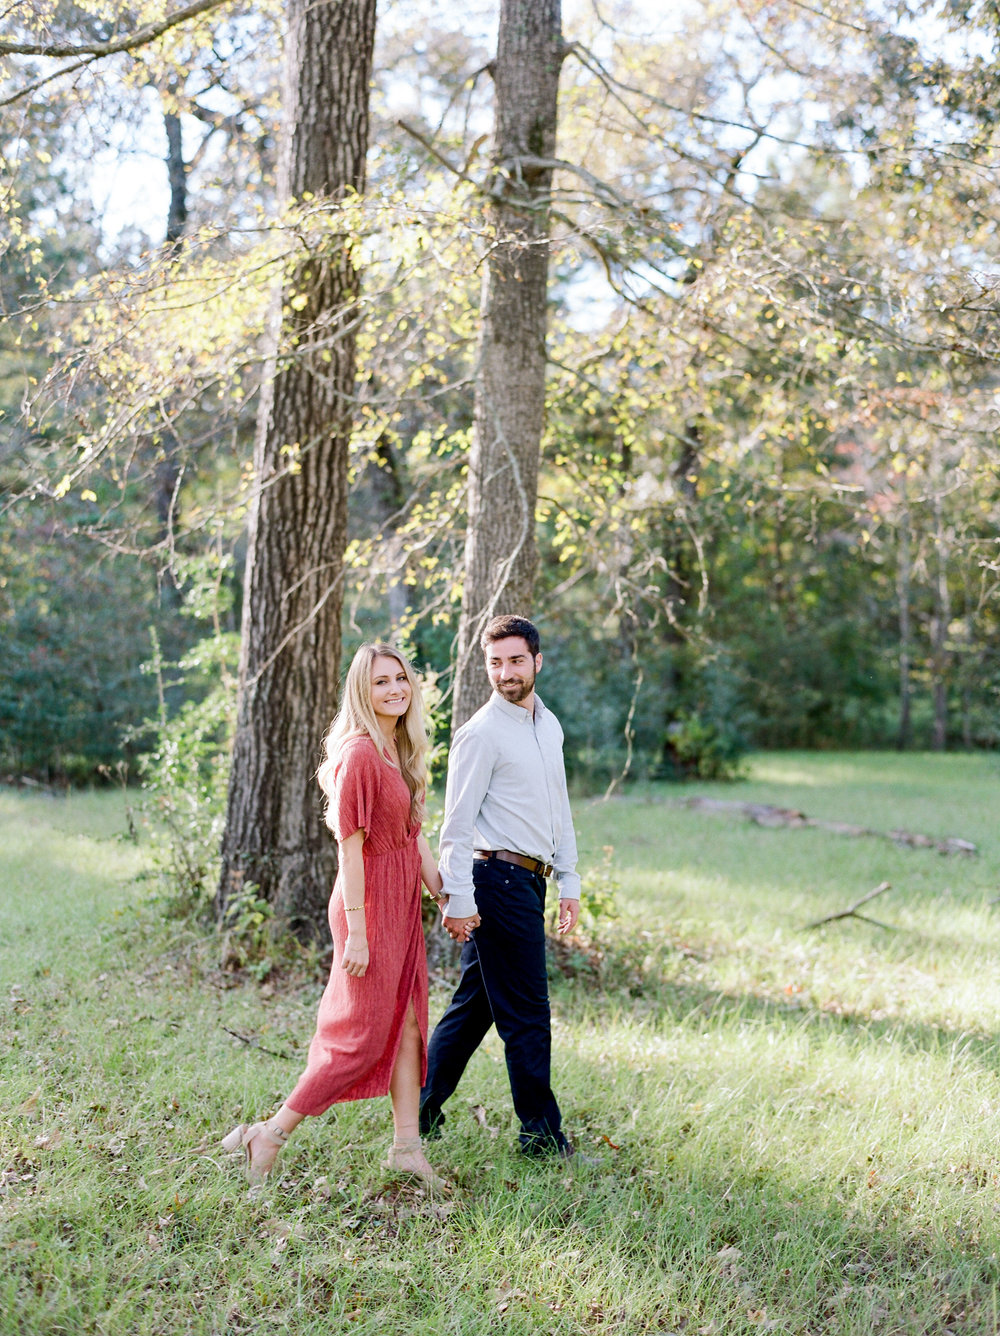 Houston-Fine-Art-Film-Destination-Wedding-Photographer-Top-Best-Luxury-Josh-Dana-Fernandez-Photographer-Austin-Texas-13.jpg